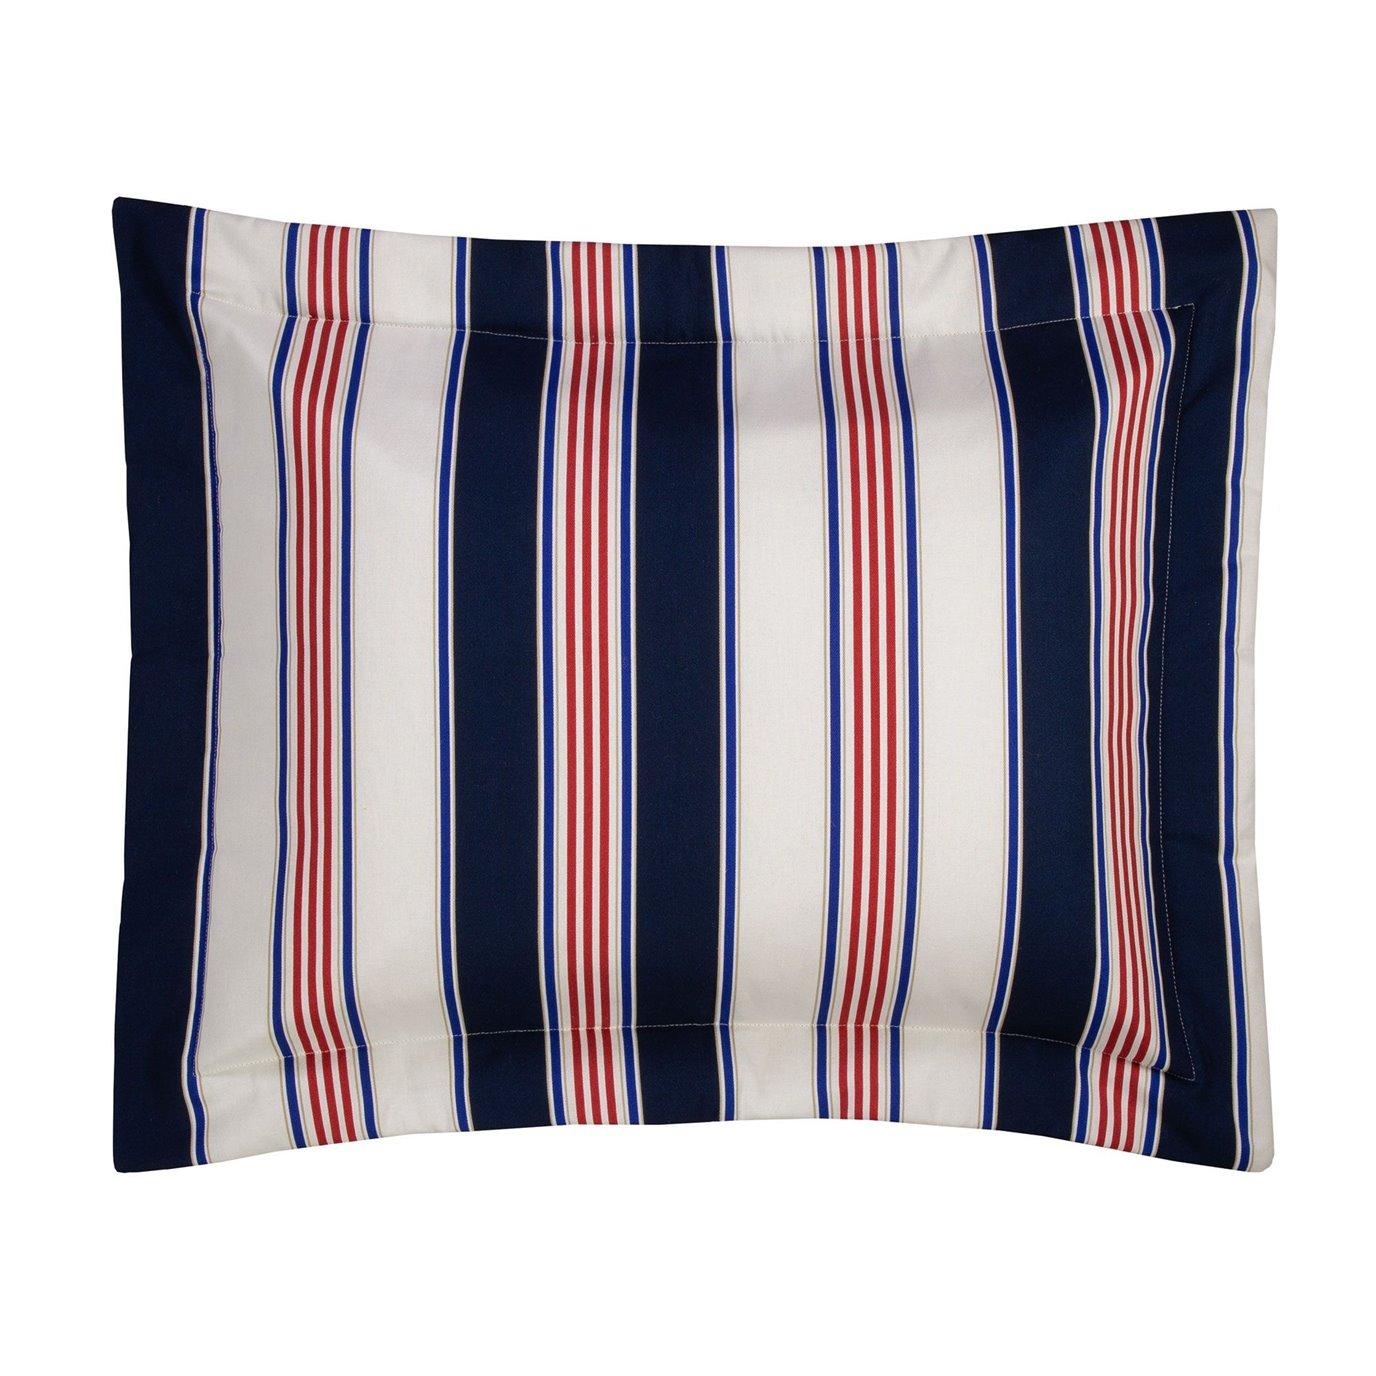 On Course Thomasville Standard Pillow Sham